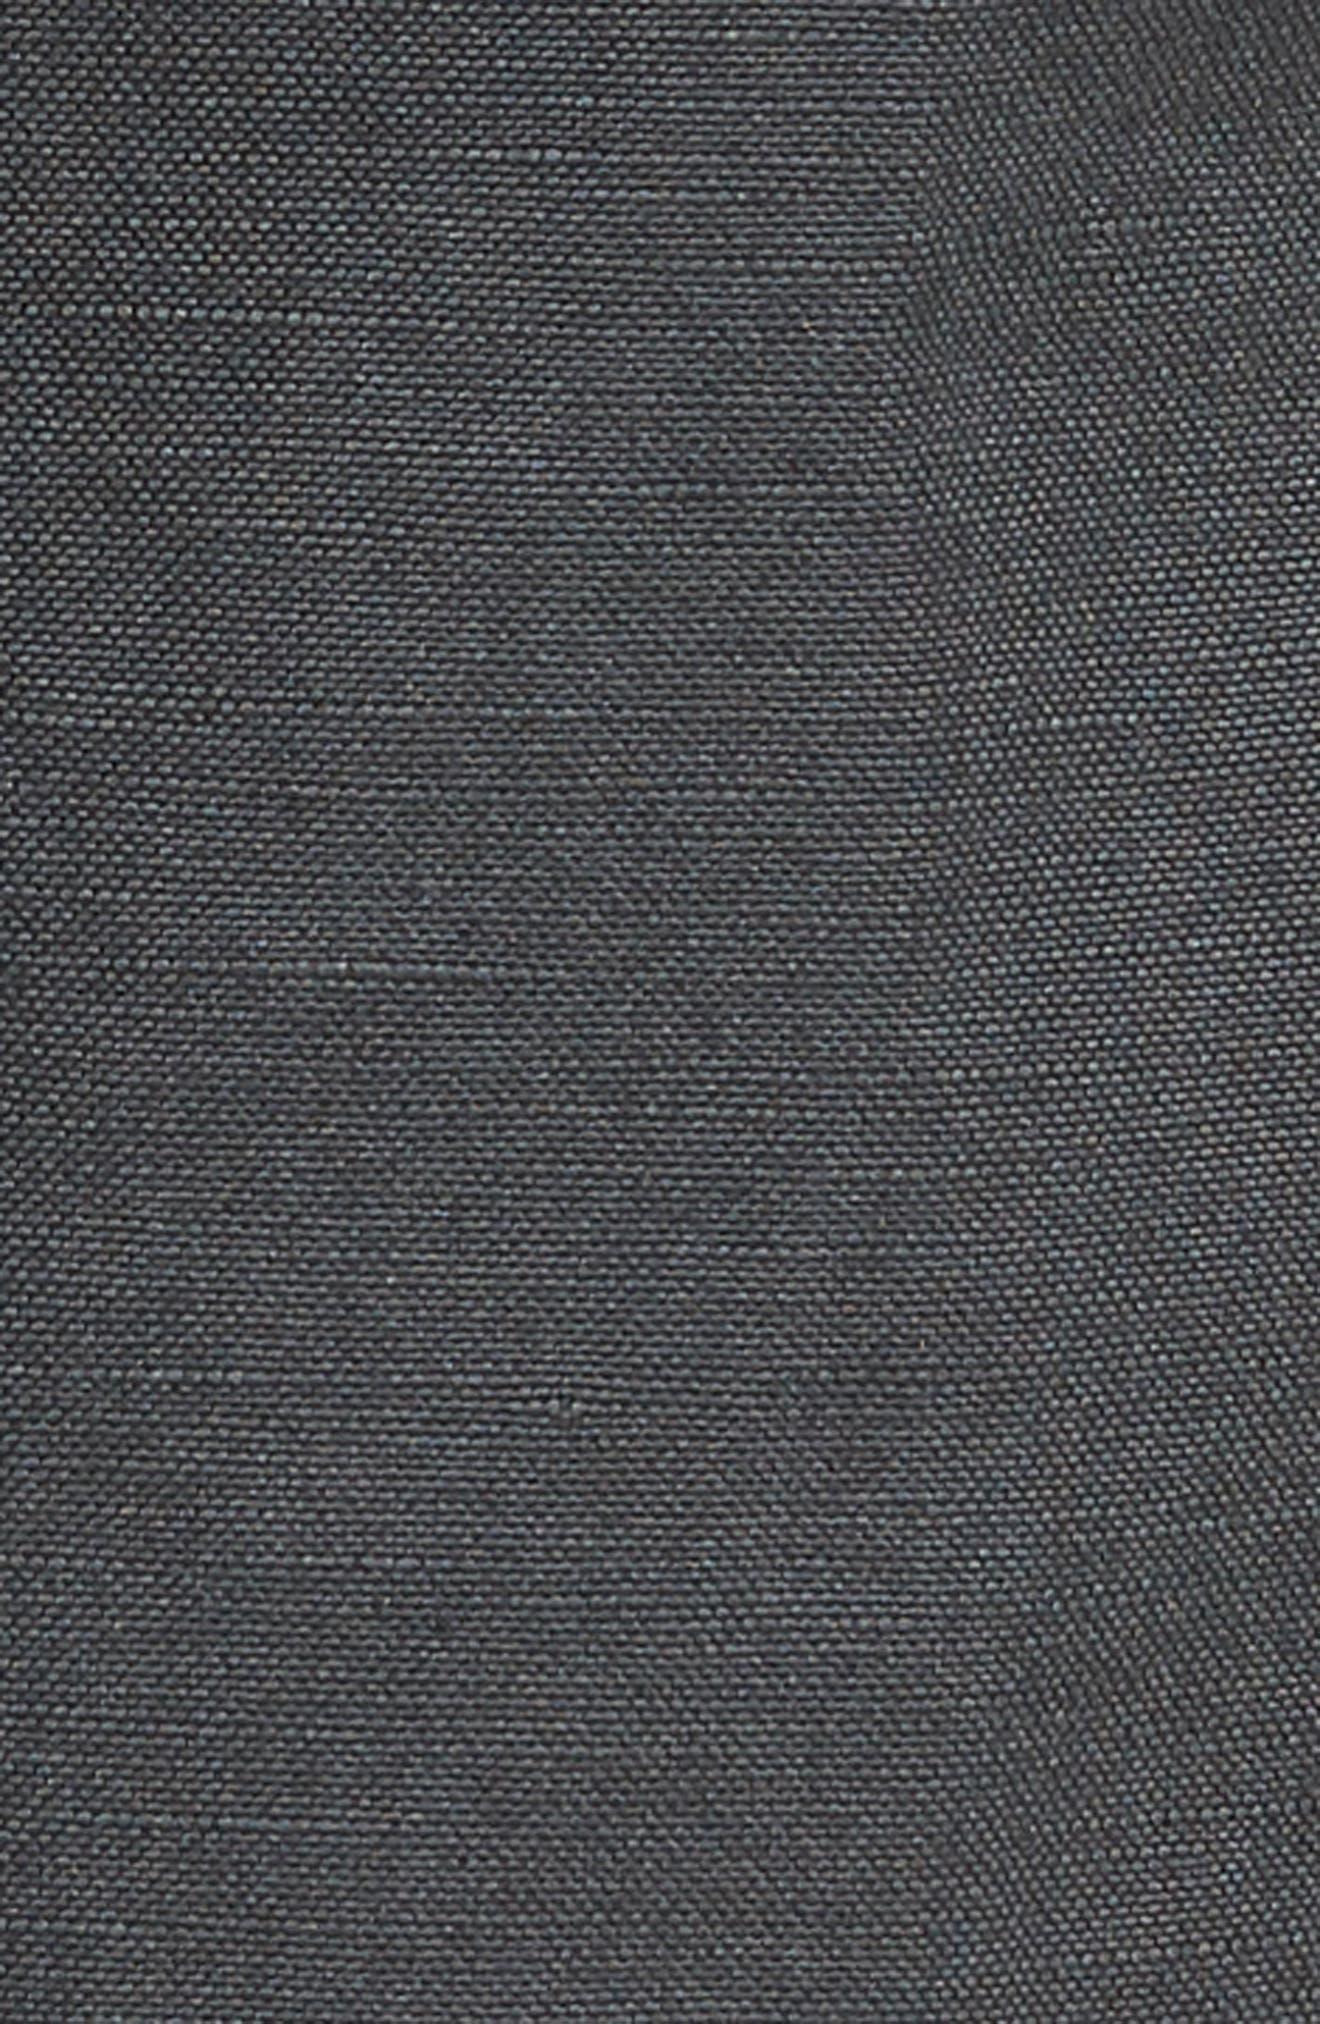 Wanderer Slim Fit Cotton & Linen Shorts,                             Alternate thumbnail 5, color,                             SULFUR SMOKE GREY